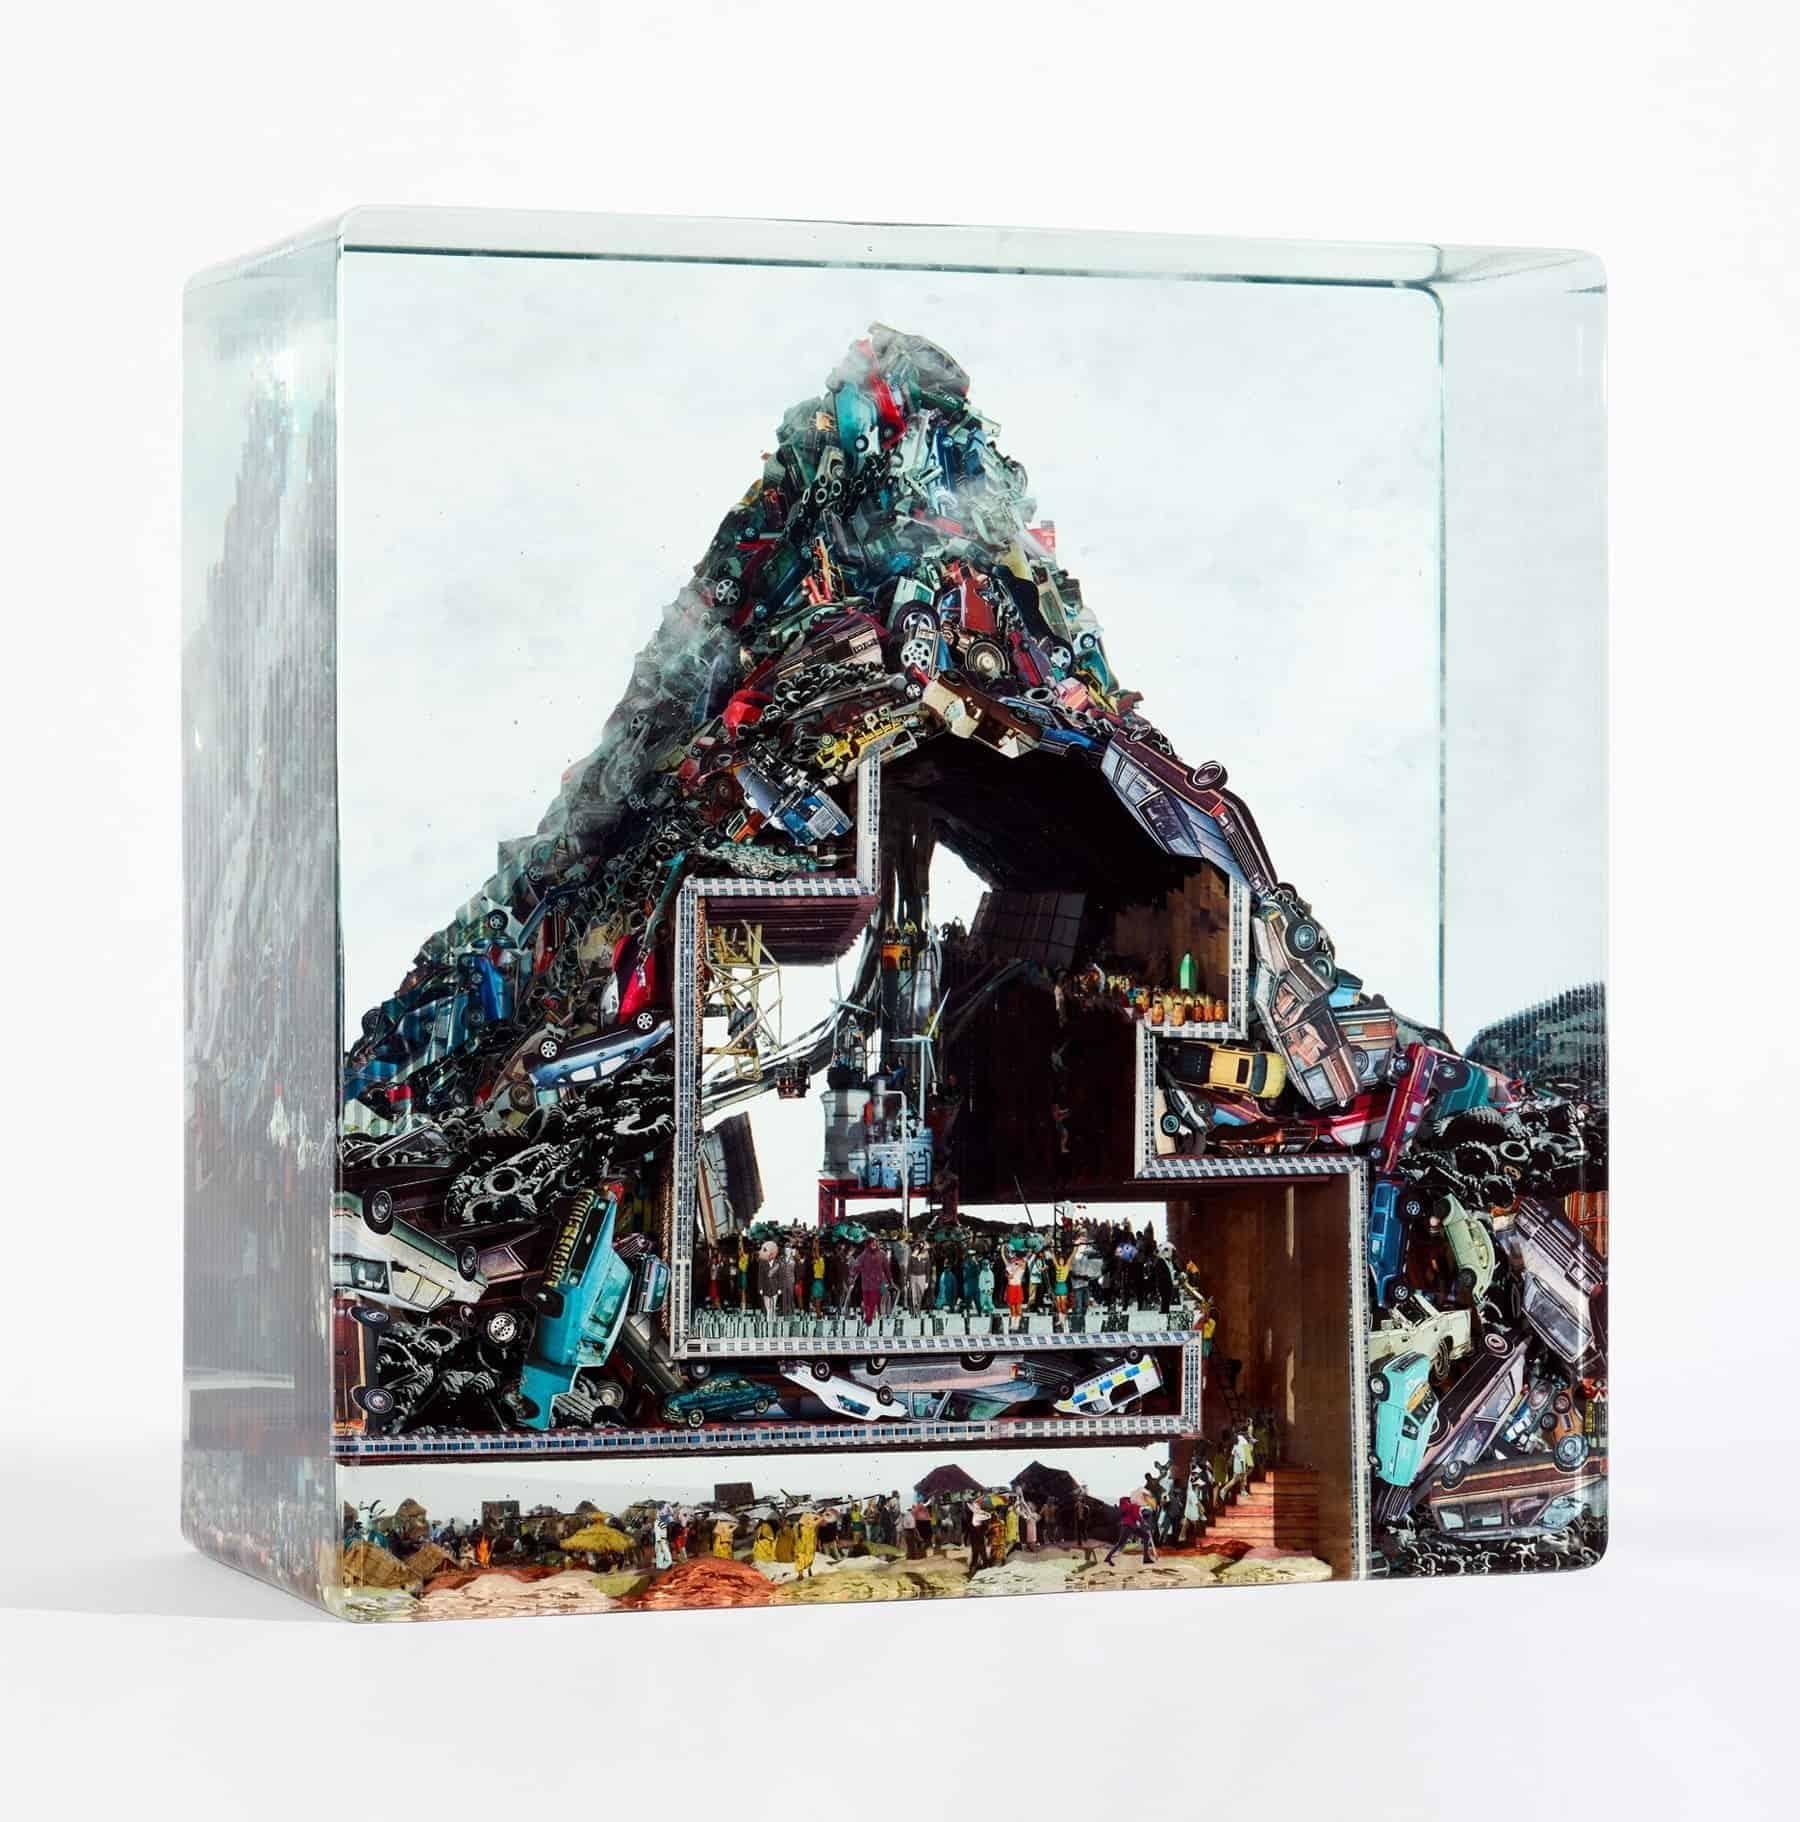 Glazen kunstwerk van Dustin Yellin